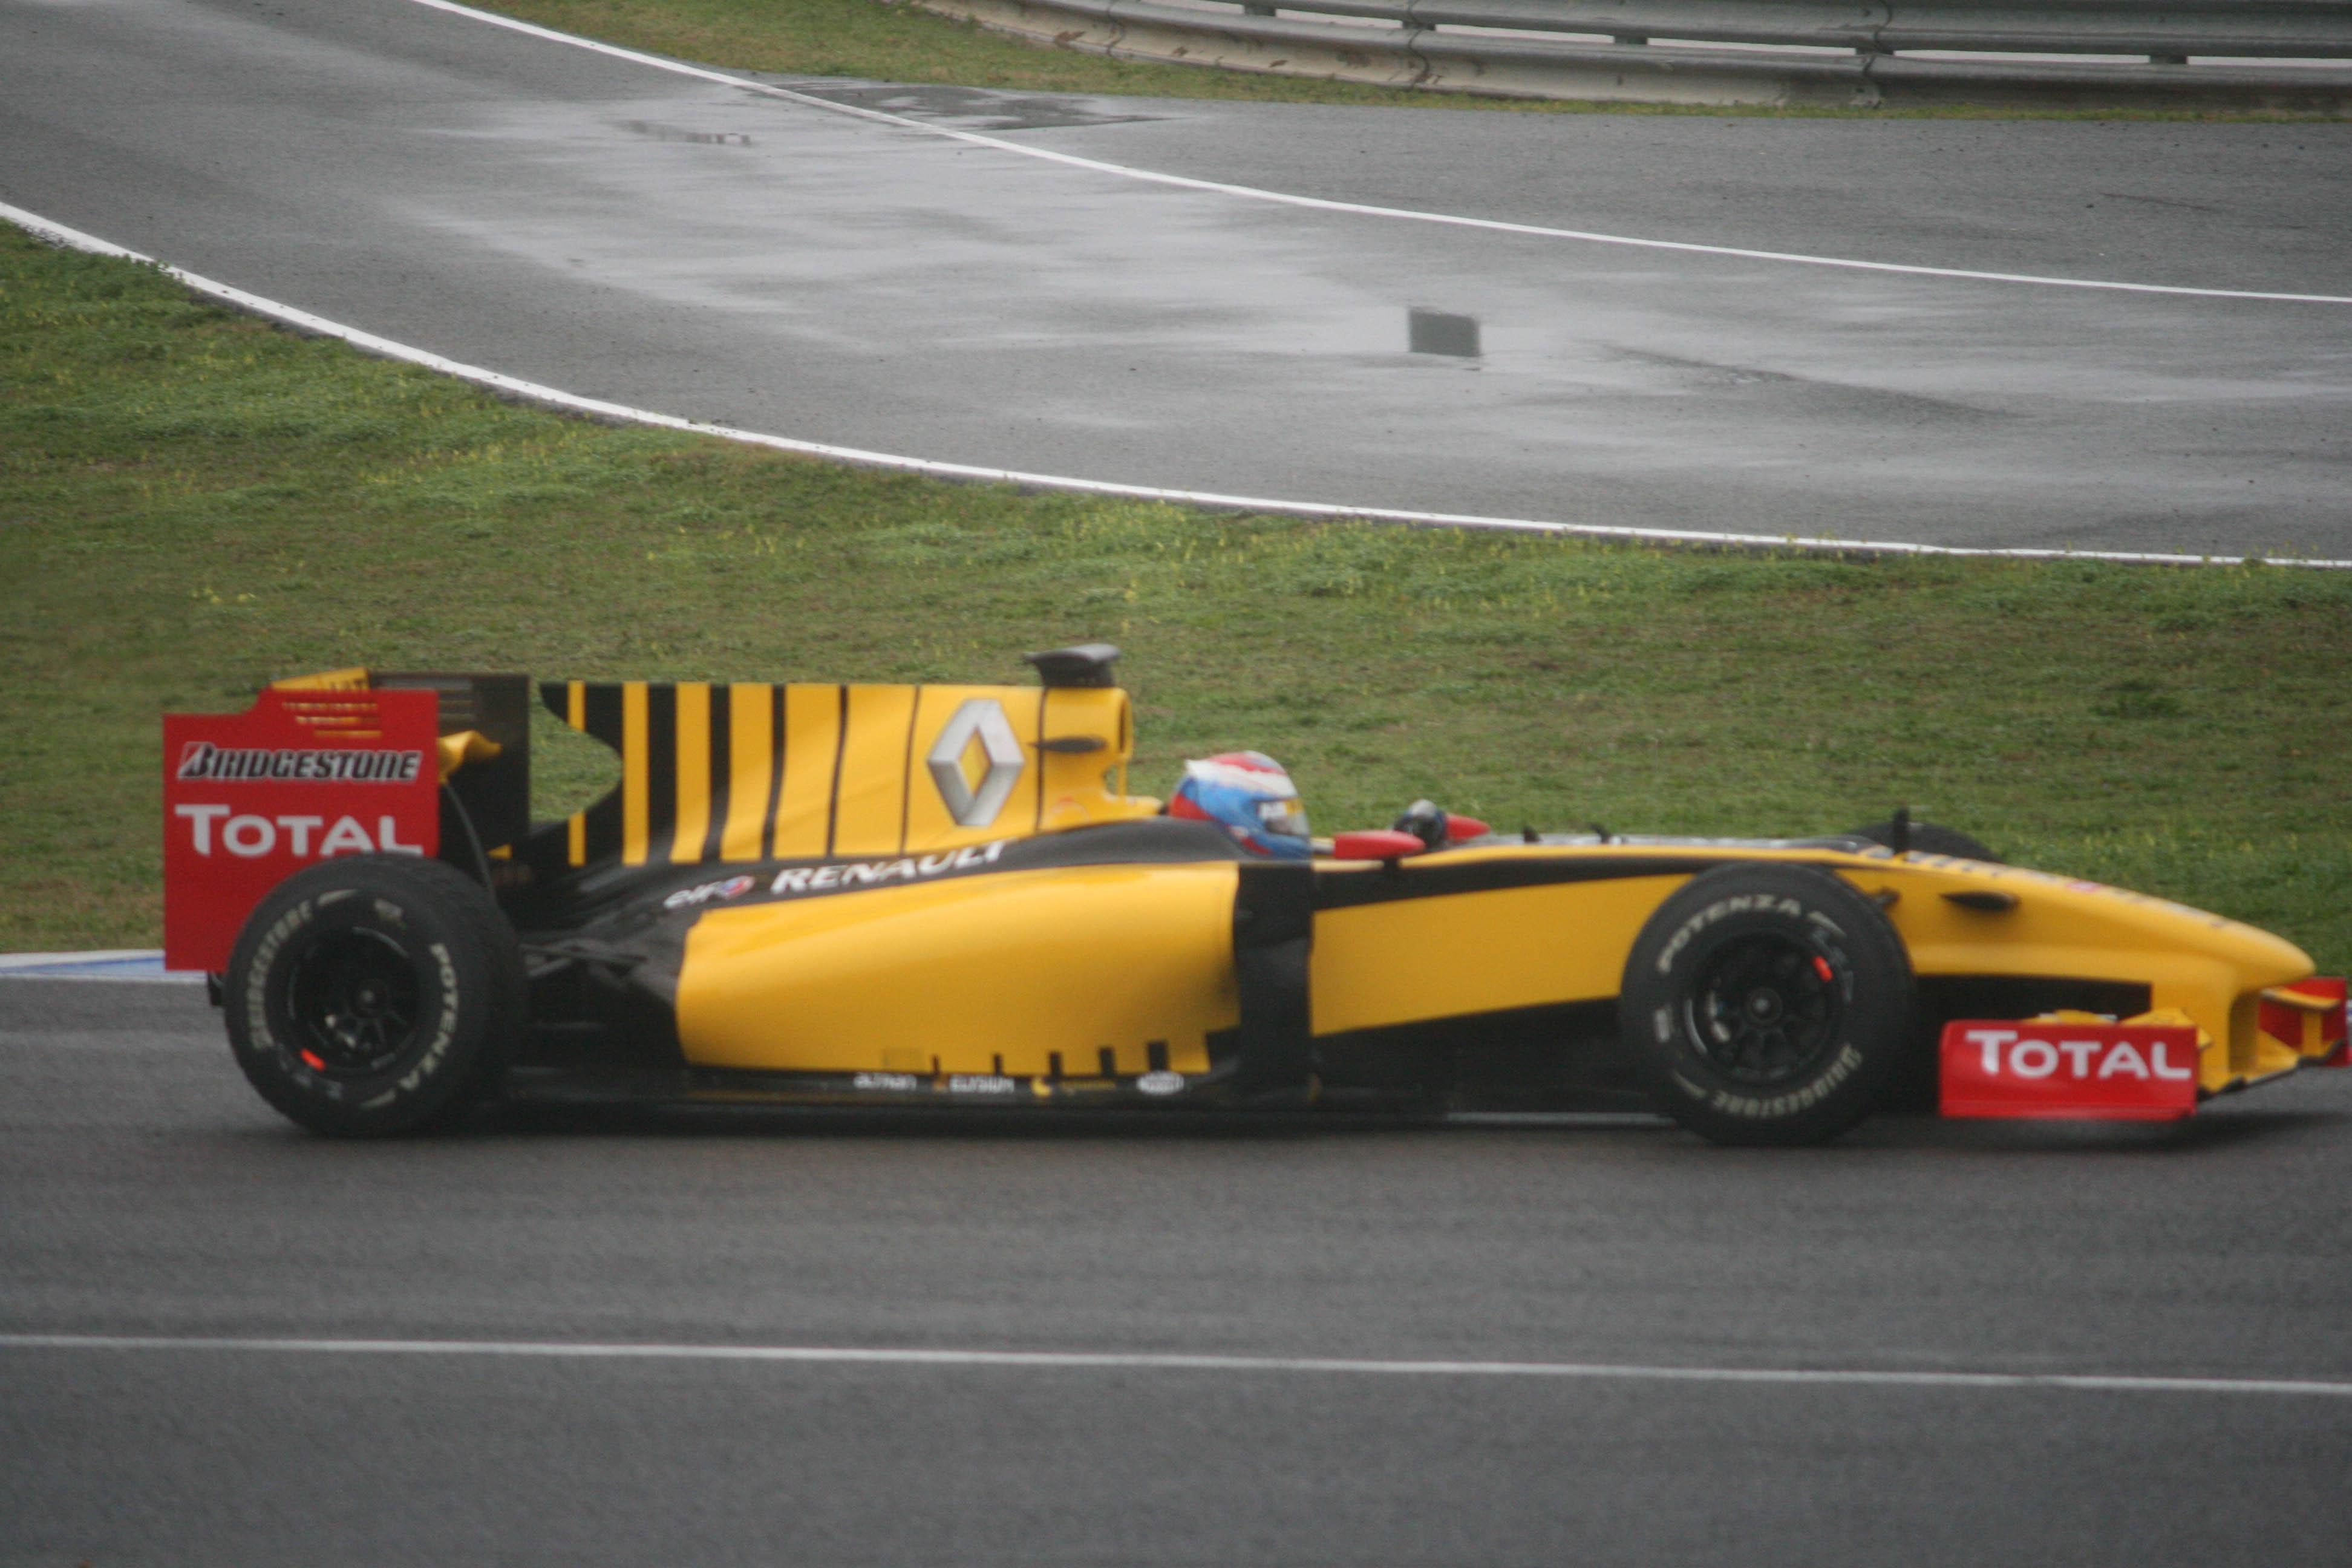 Vitaly_Petrov_2010_Jerez_test.jpg